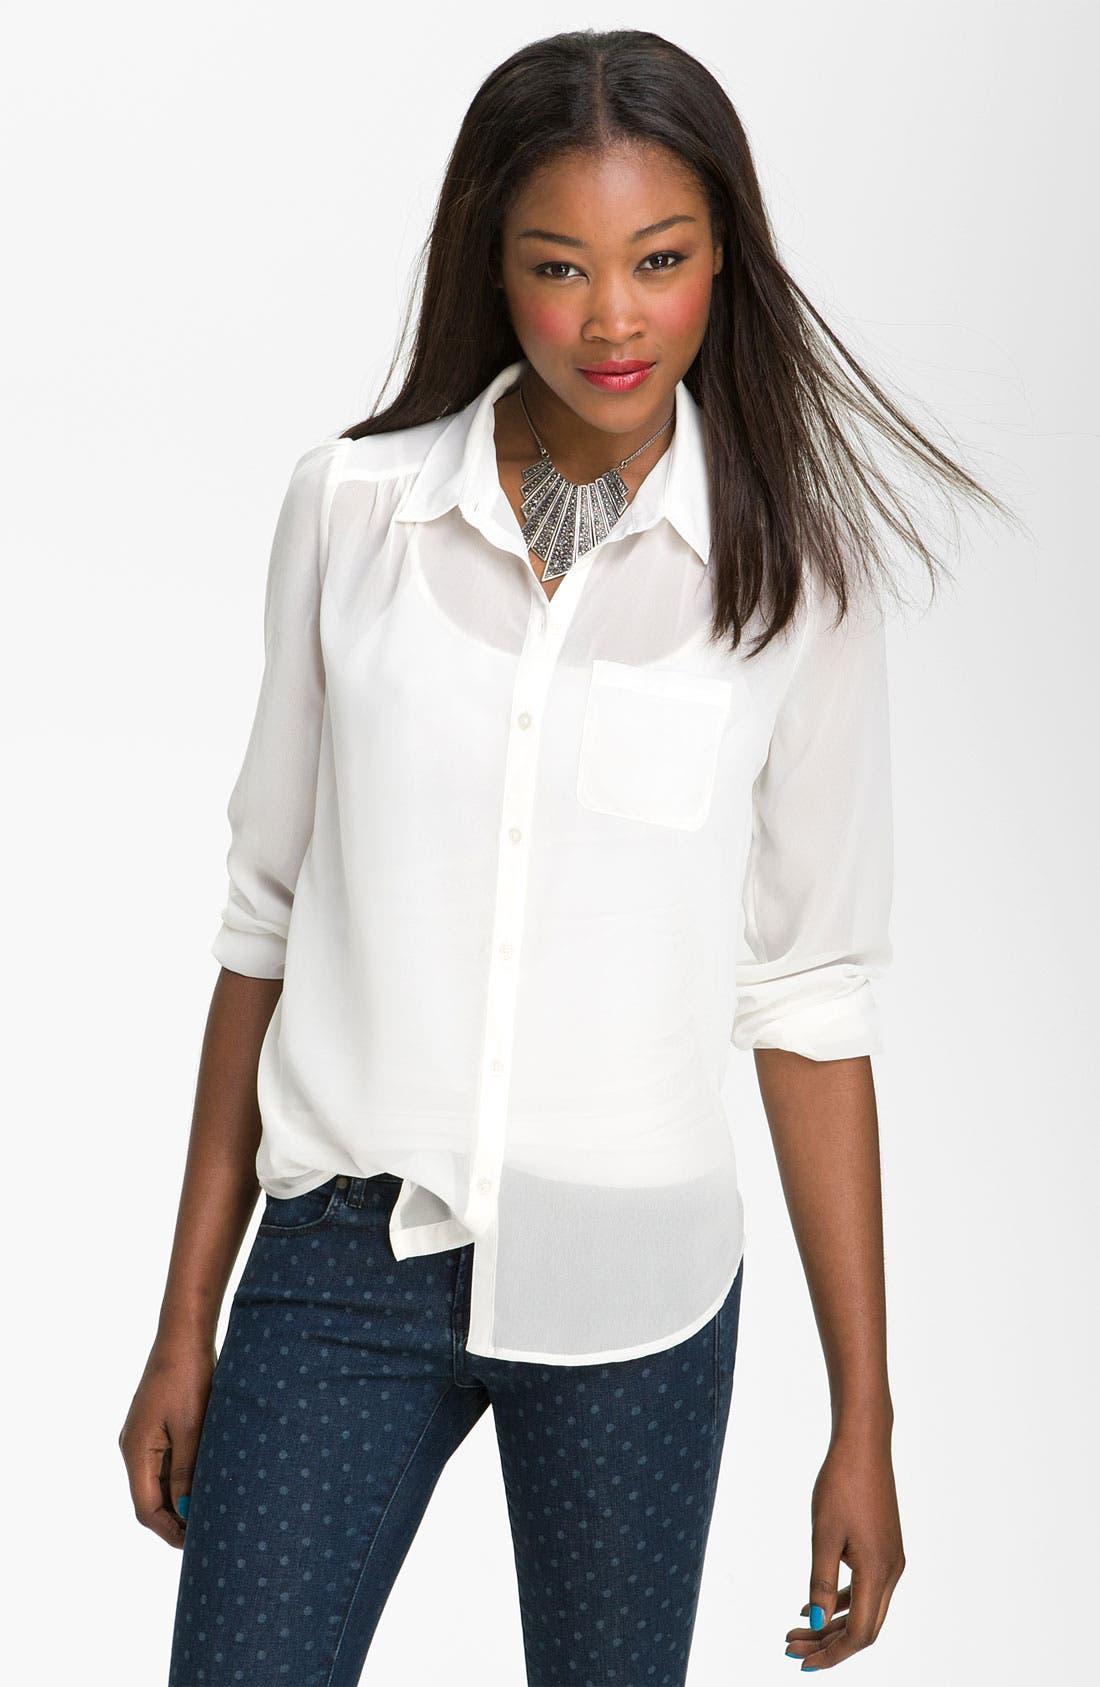 Alternate Image 1 Selected - Frenchi® Sheer Chiffon Shirt (Juniors)